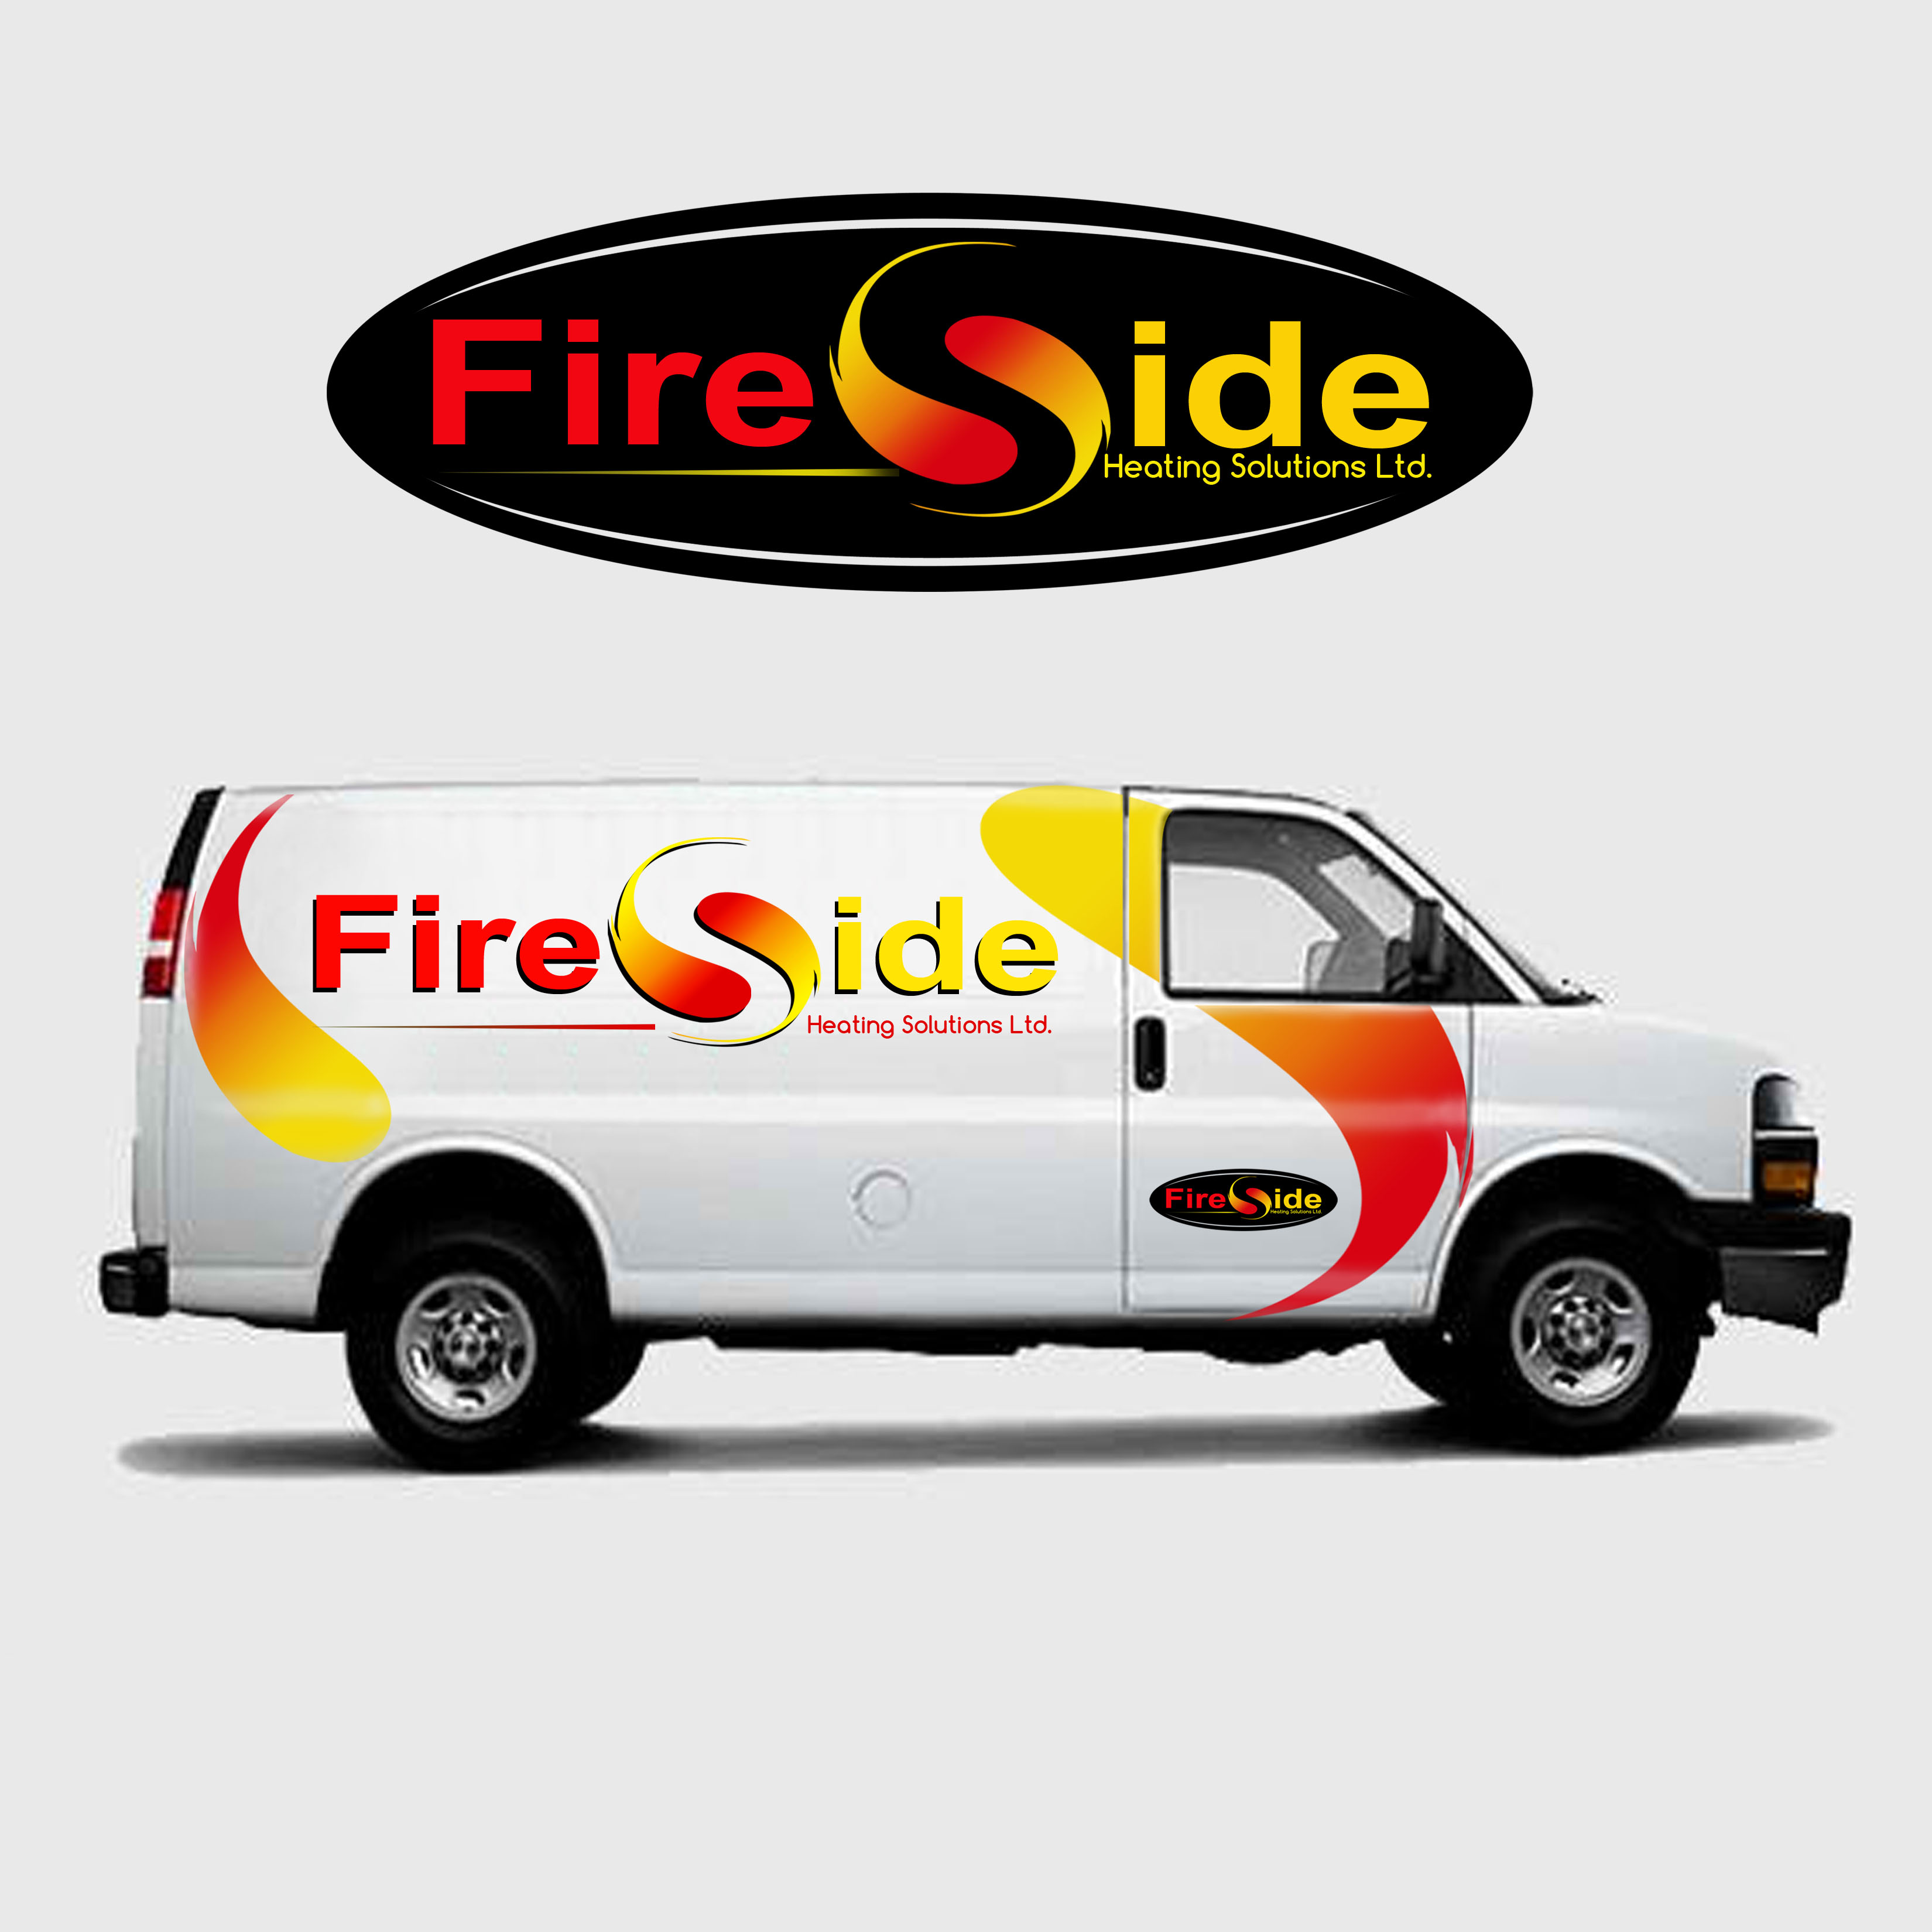 Logo Design by Allan Esclamado - Entry No. 39 in the Logo Design Contest Creative Logo Design for Fireside Heating Solutions Ltd..